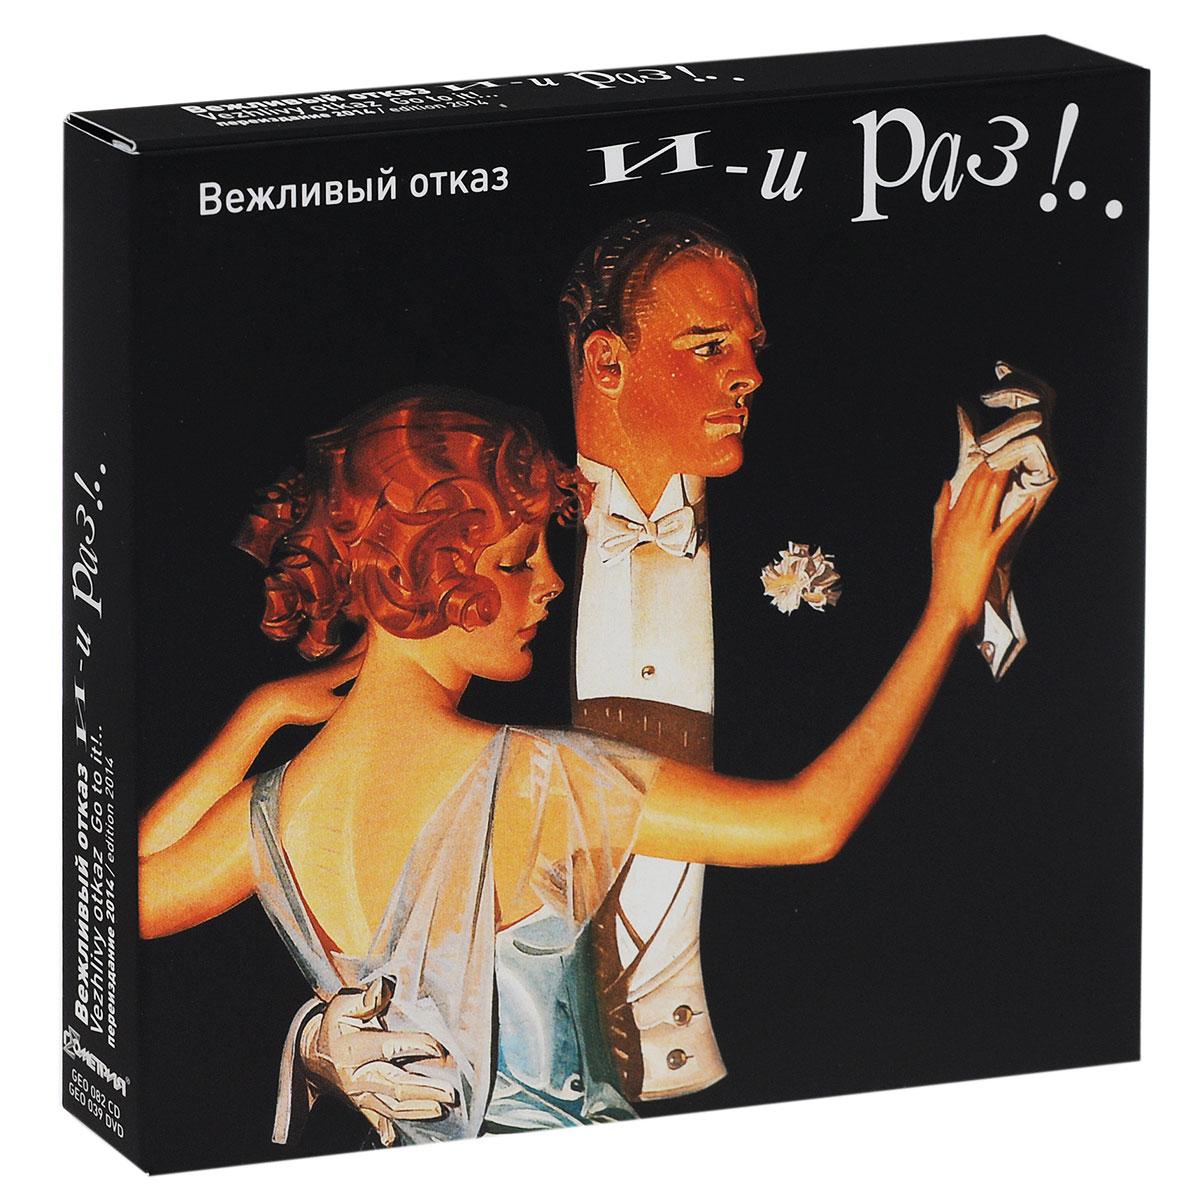 Bonus DVD содержит:  Шаболовка (Москва), ноябрь 1992 года01. Икар / Icarus 02. Ревельский чарльстон / Revel Charleston 03. Пессимистический рэгге / Pessimistic Reggae04. Вальс / Waltz 5. Танго / Tango 6. Босса-нова / Bossa NovaКЦ